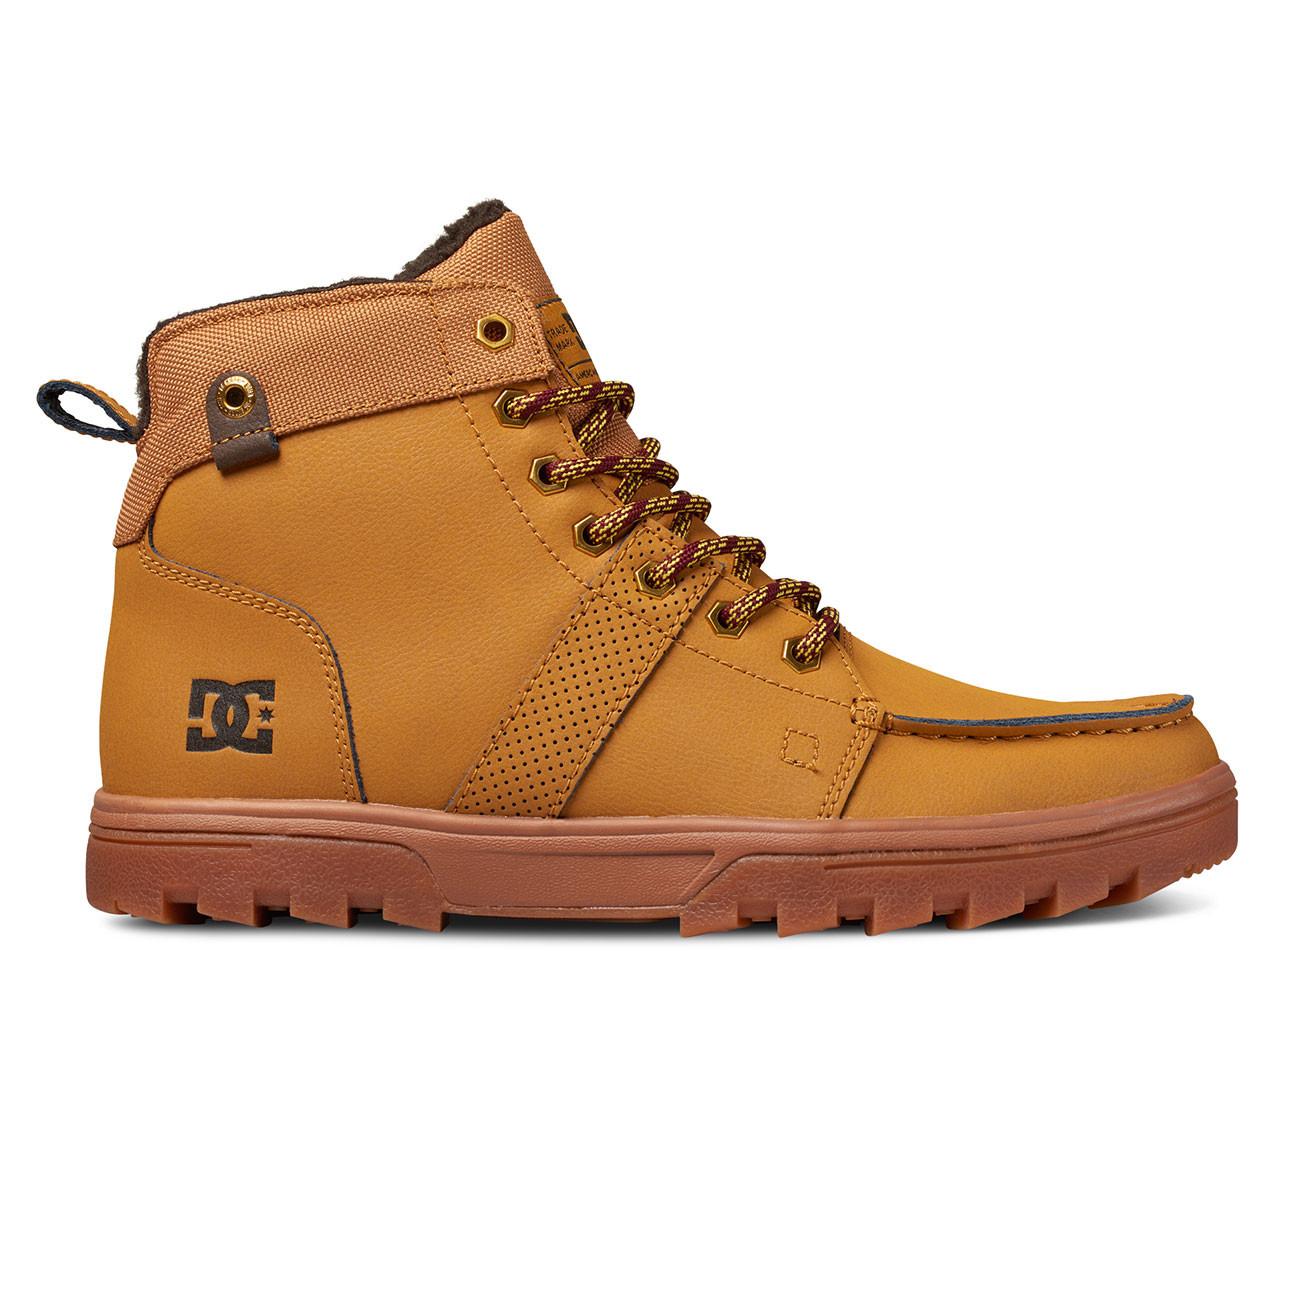 Zimní boty DC Woodland wheat black  86cc9c7989